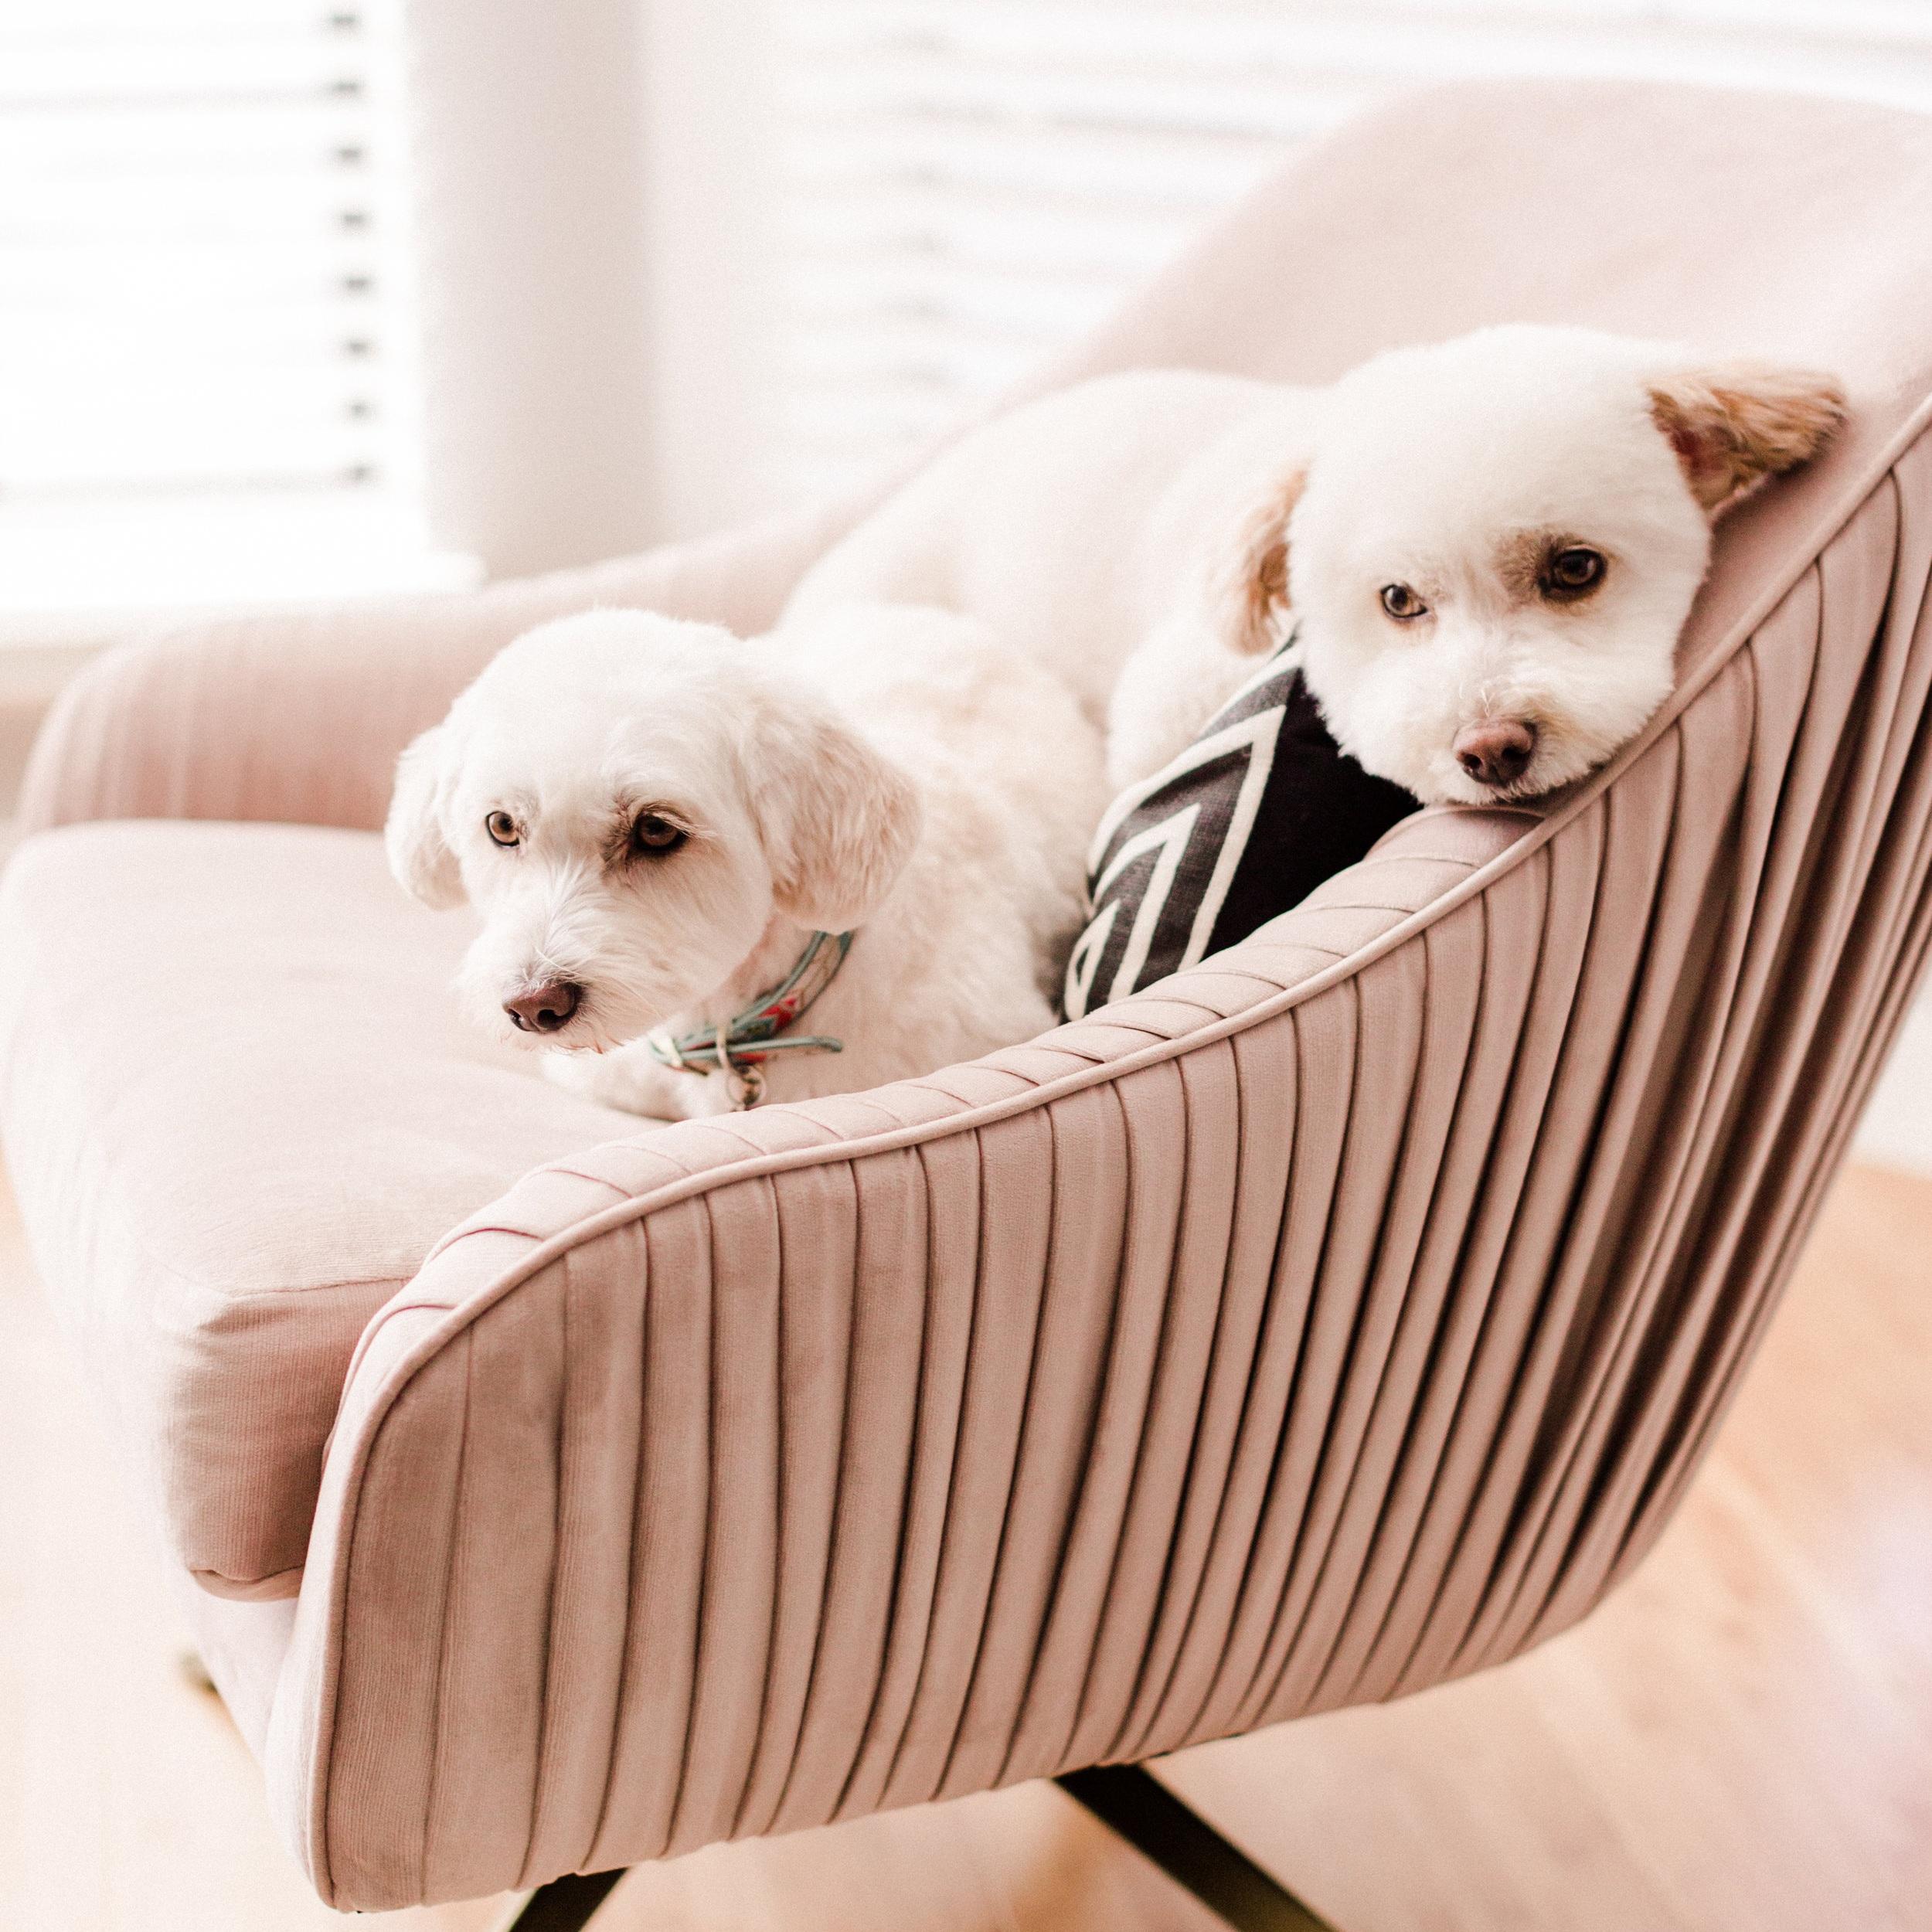 Rhianna-Mercier-Photography-San_Fransisco-CA-2018-Puppies-6166.jpg